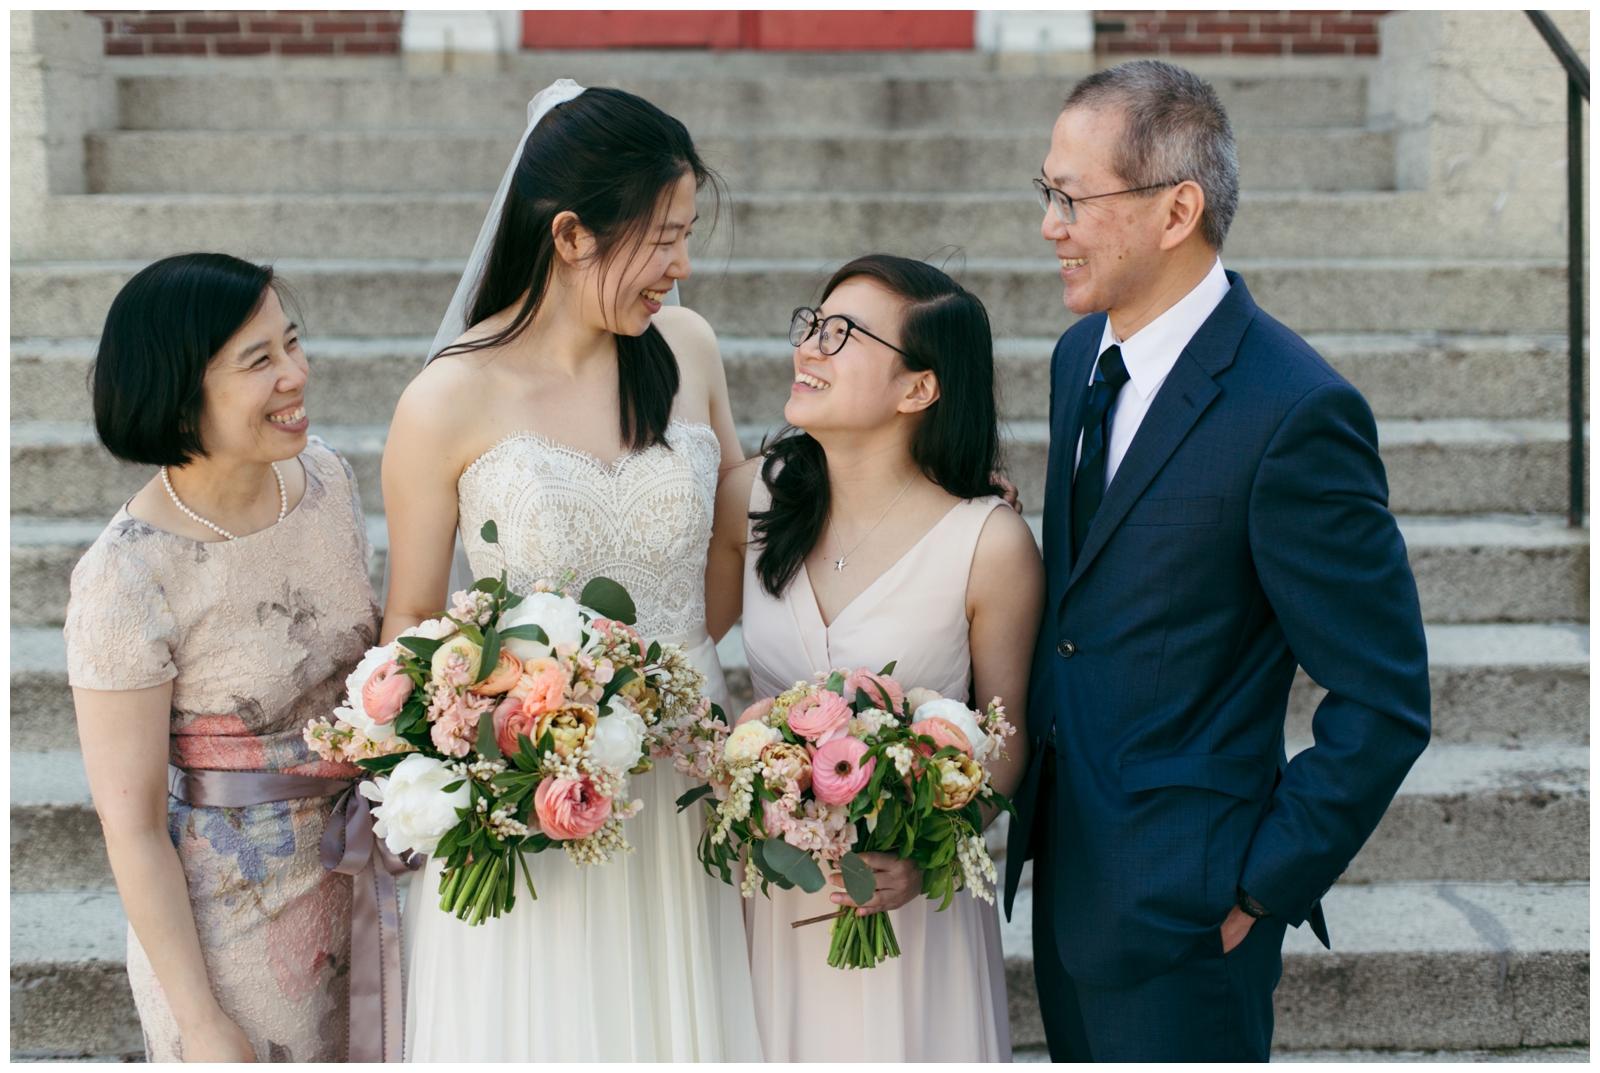 Samberg-Conference-Center-Boston-Wedding-Photographer-Bailey-Q-Photo-072.jpg